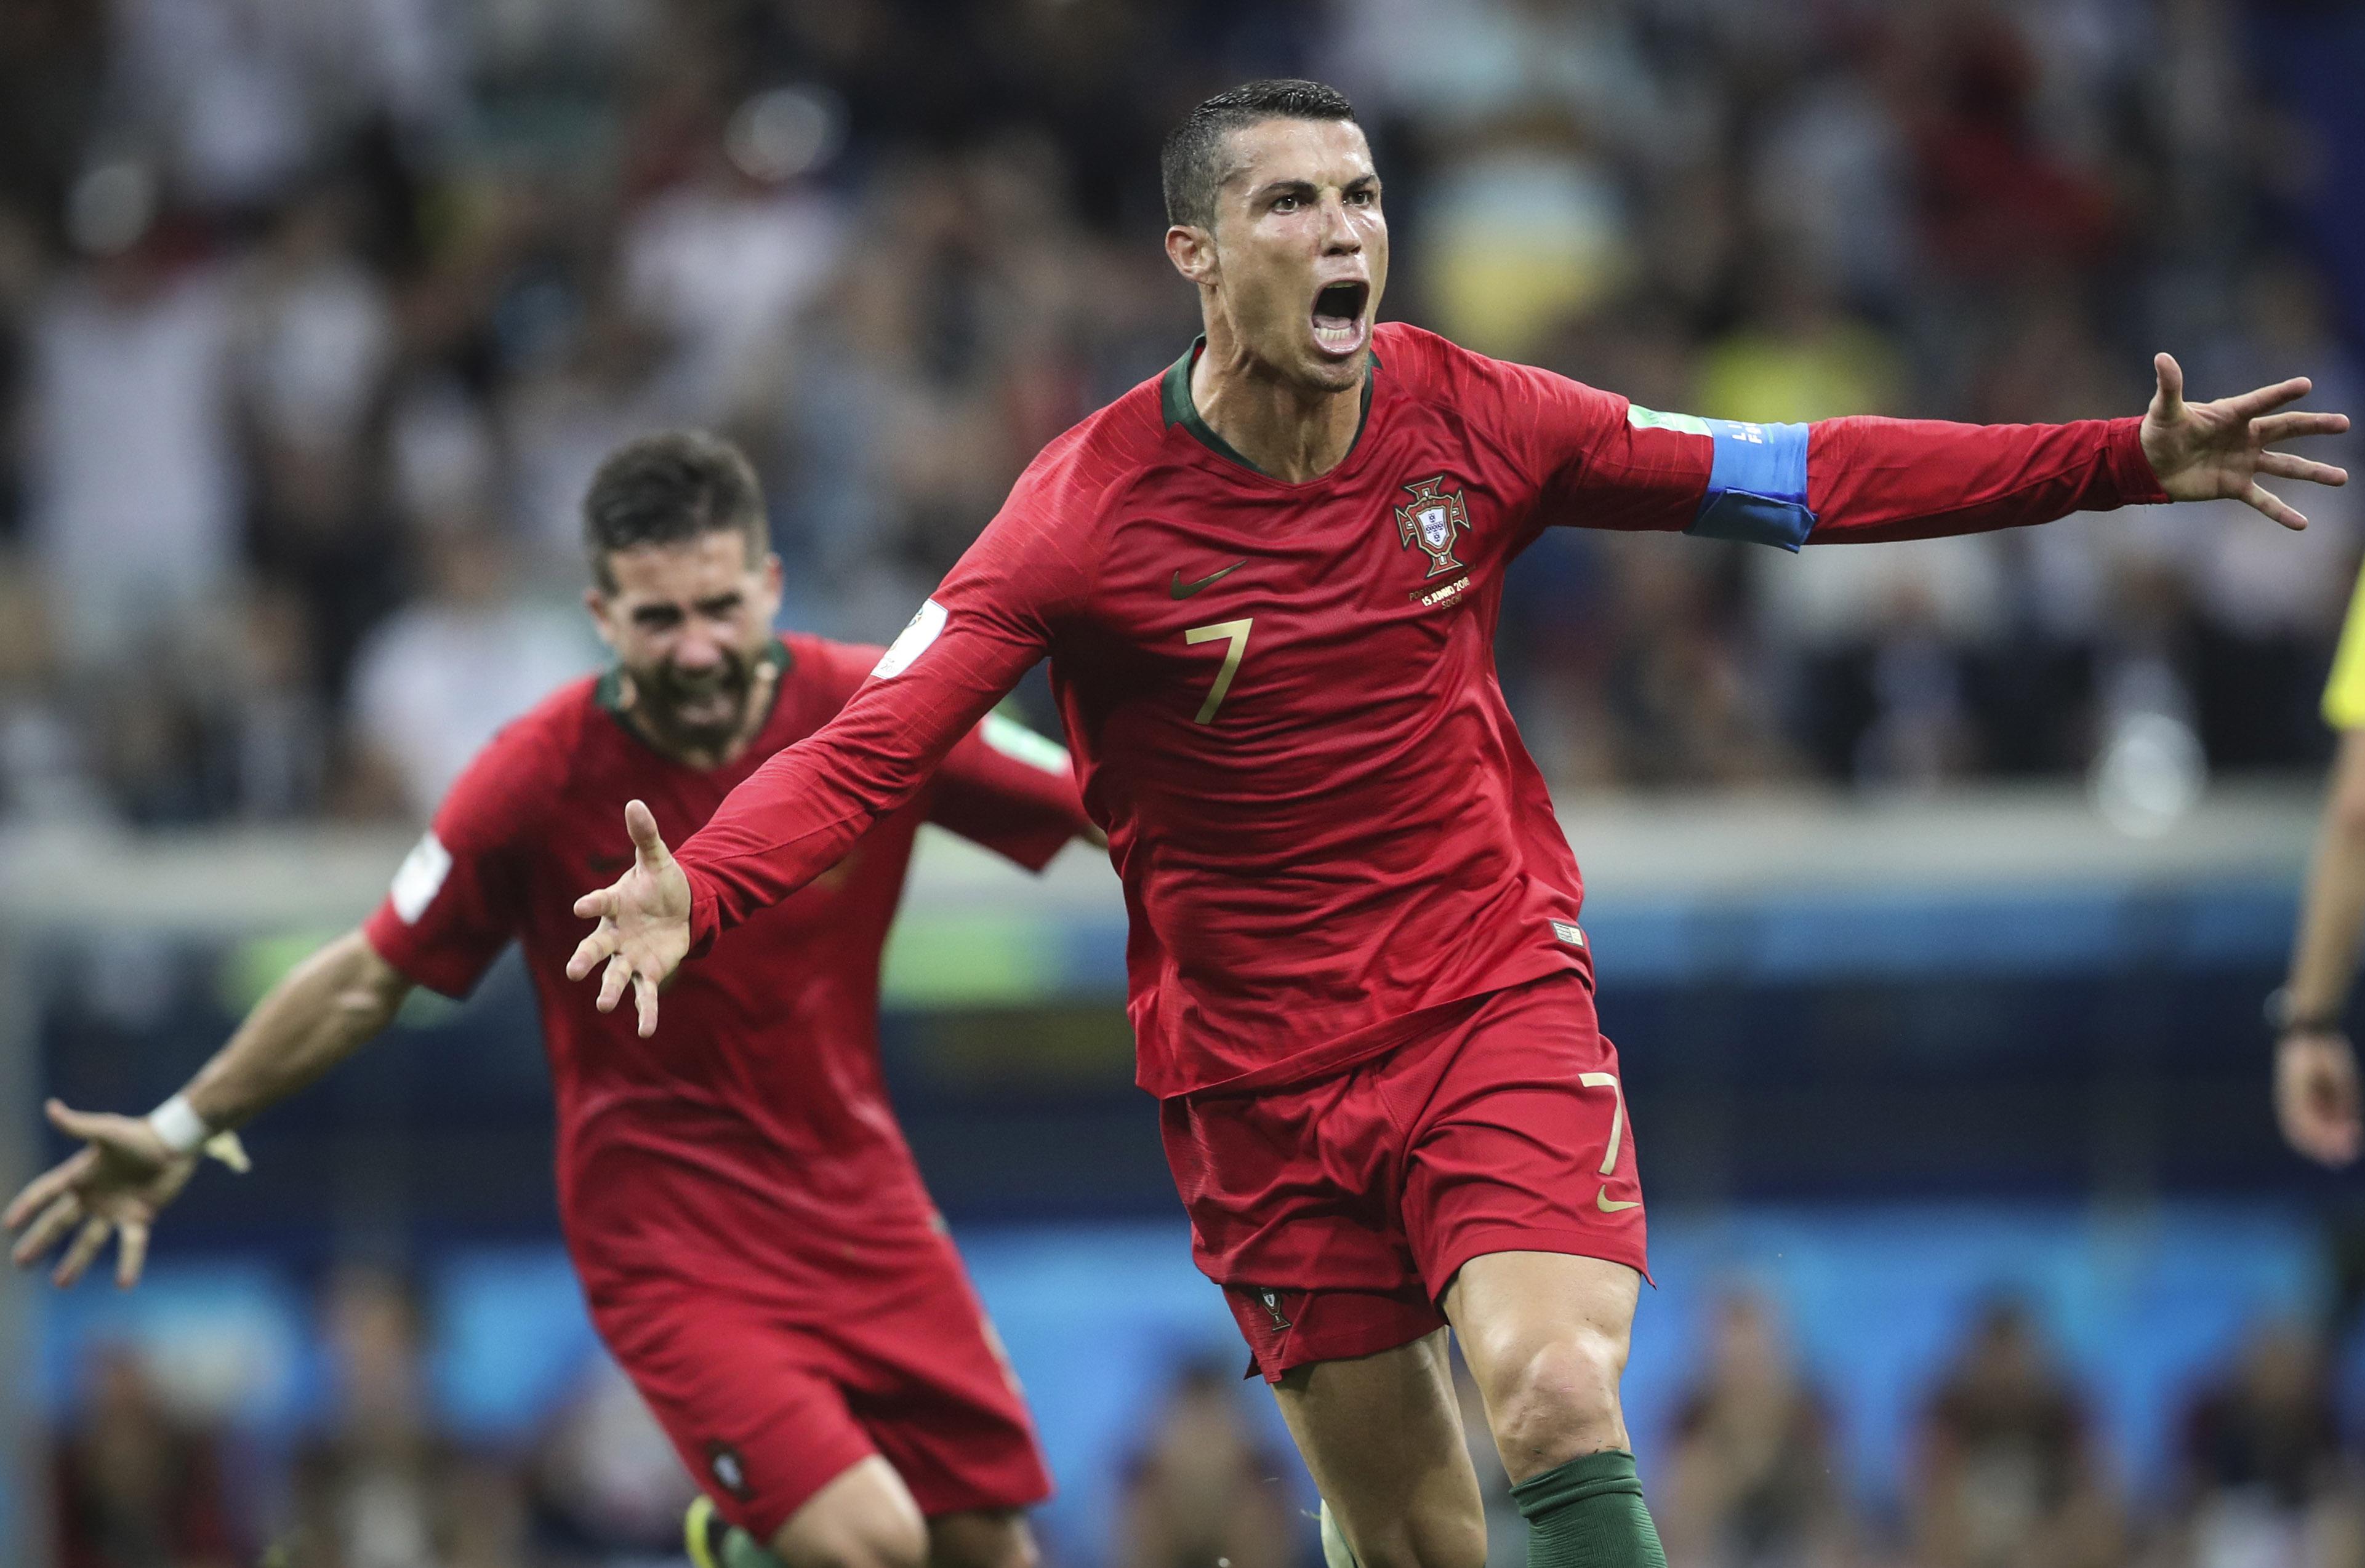 Cristiano Ronaldo shakes soccer world by joining ManU